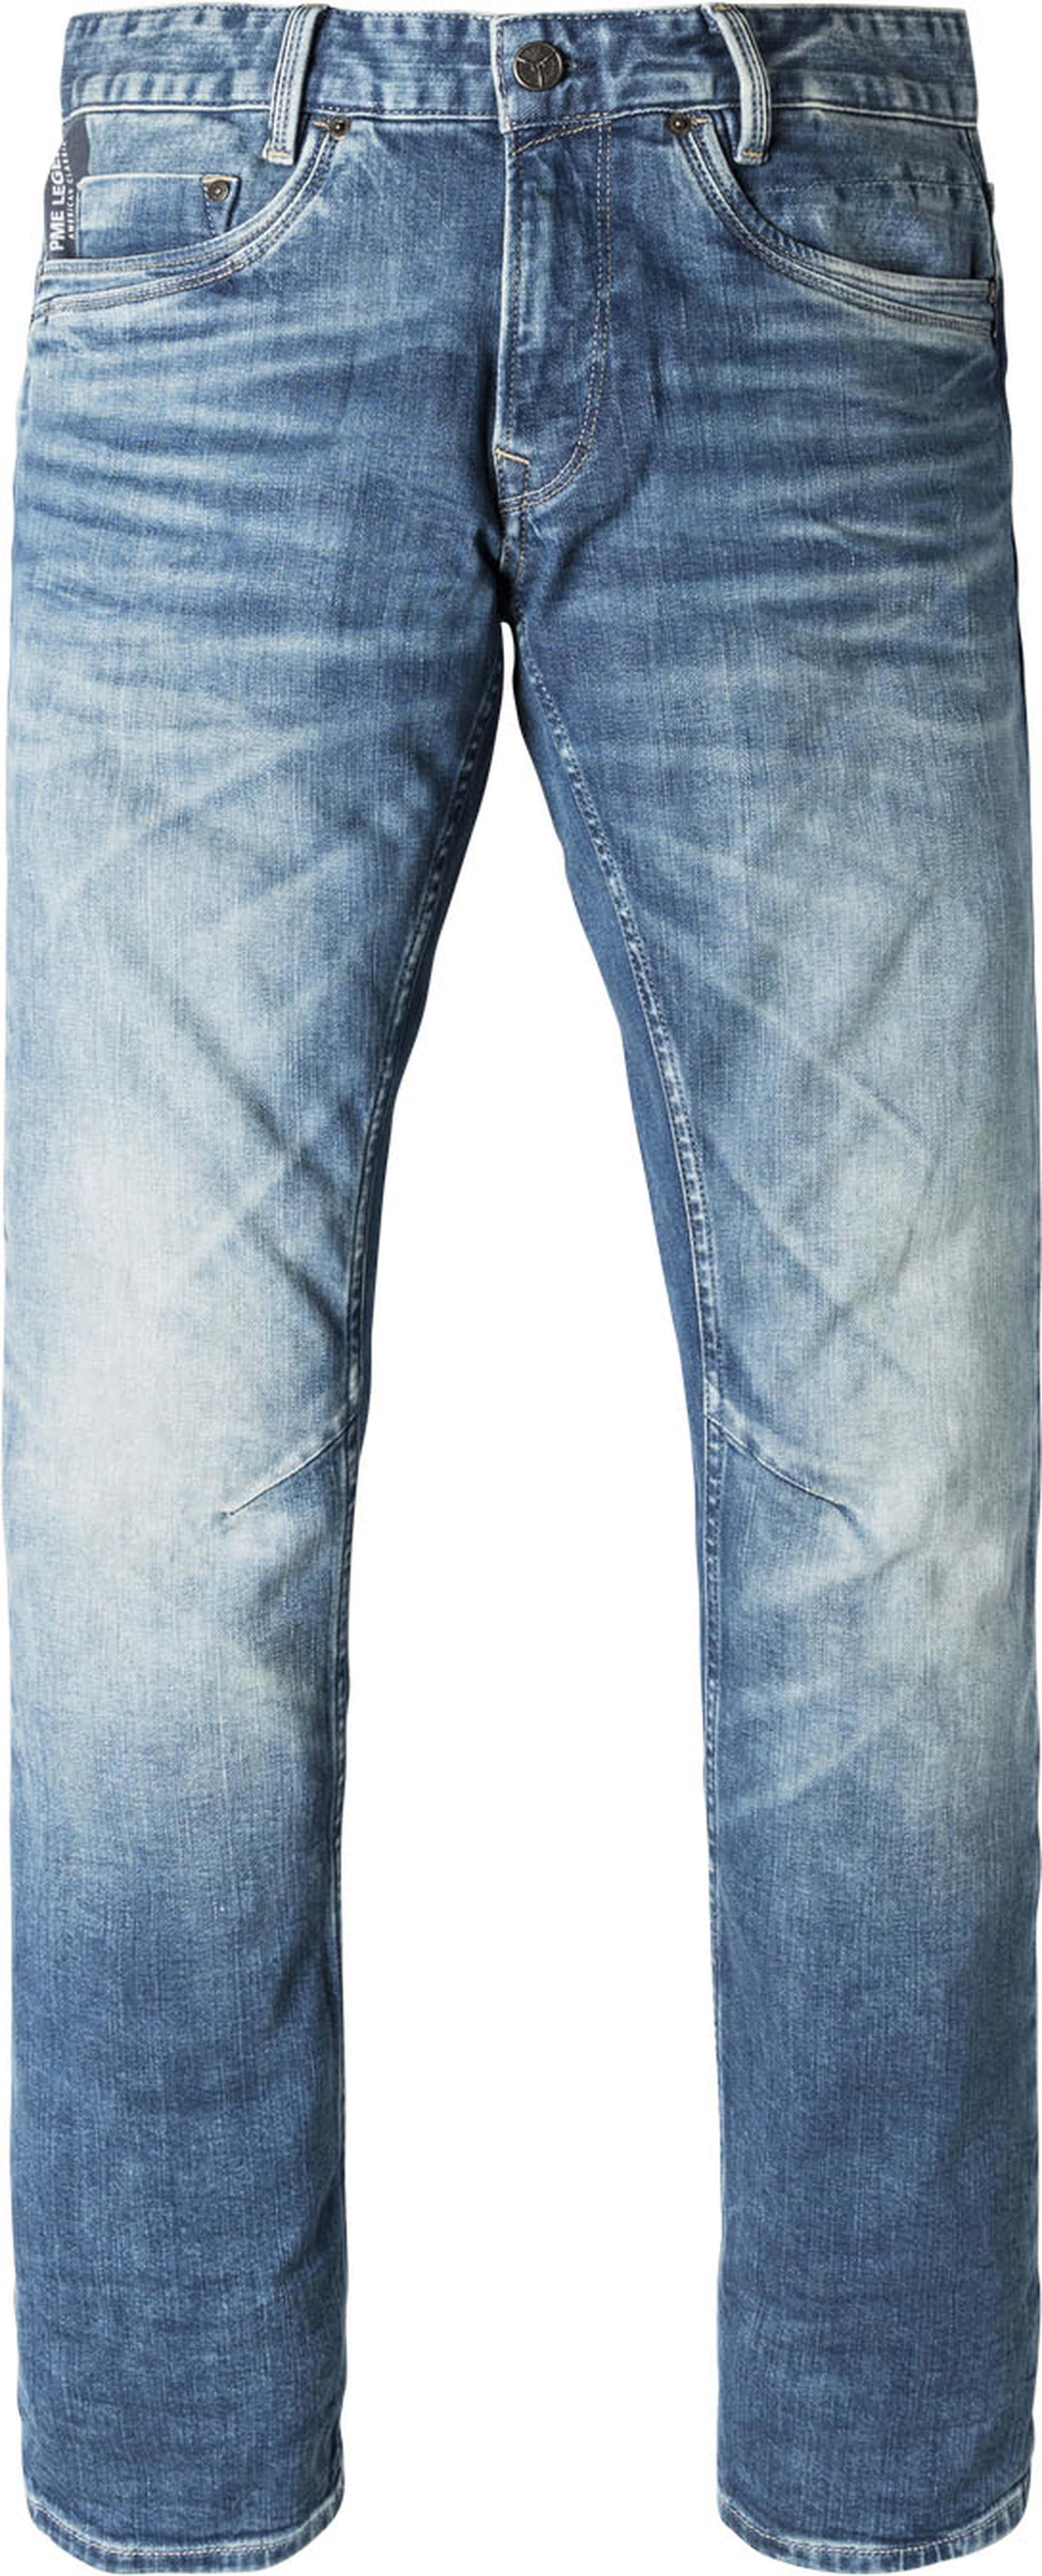 PME Legend Skymaster Jeans Blue